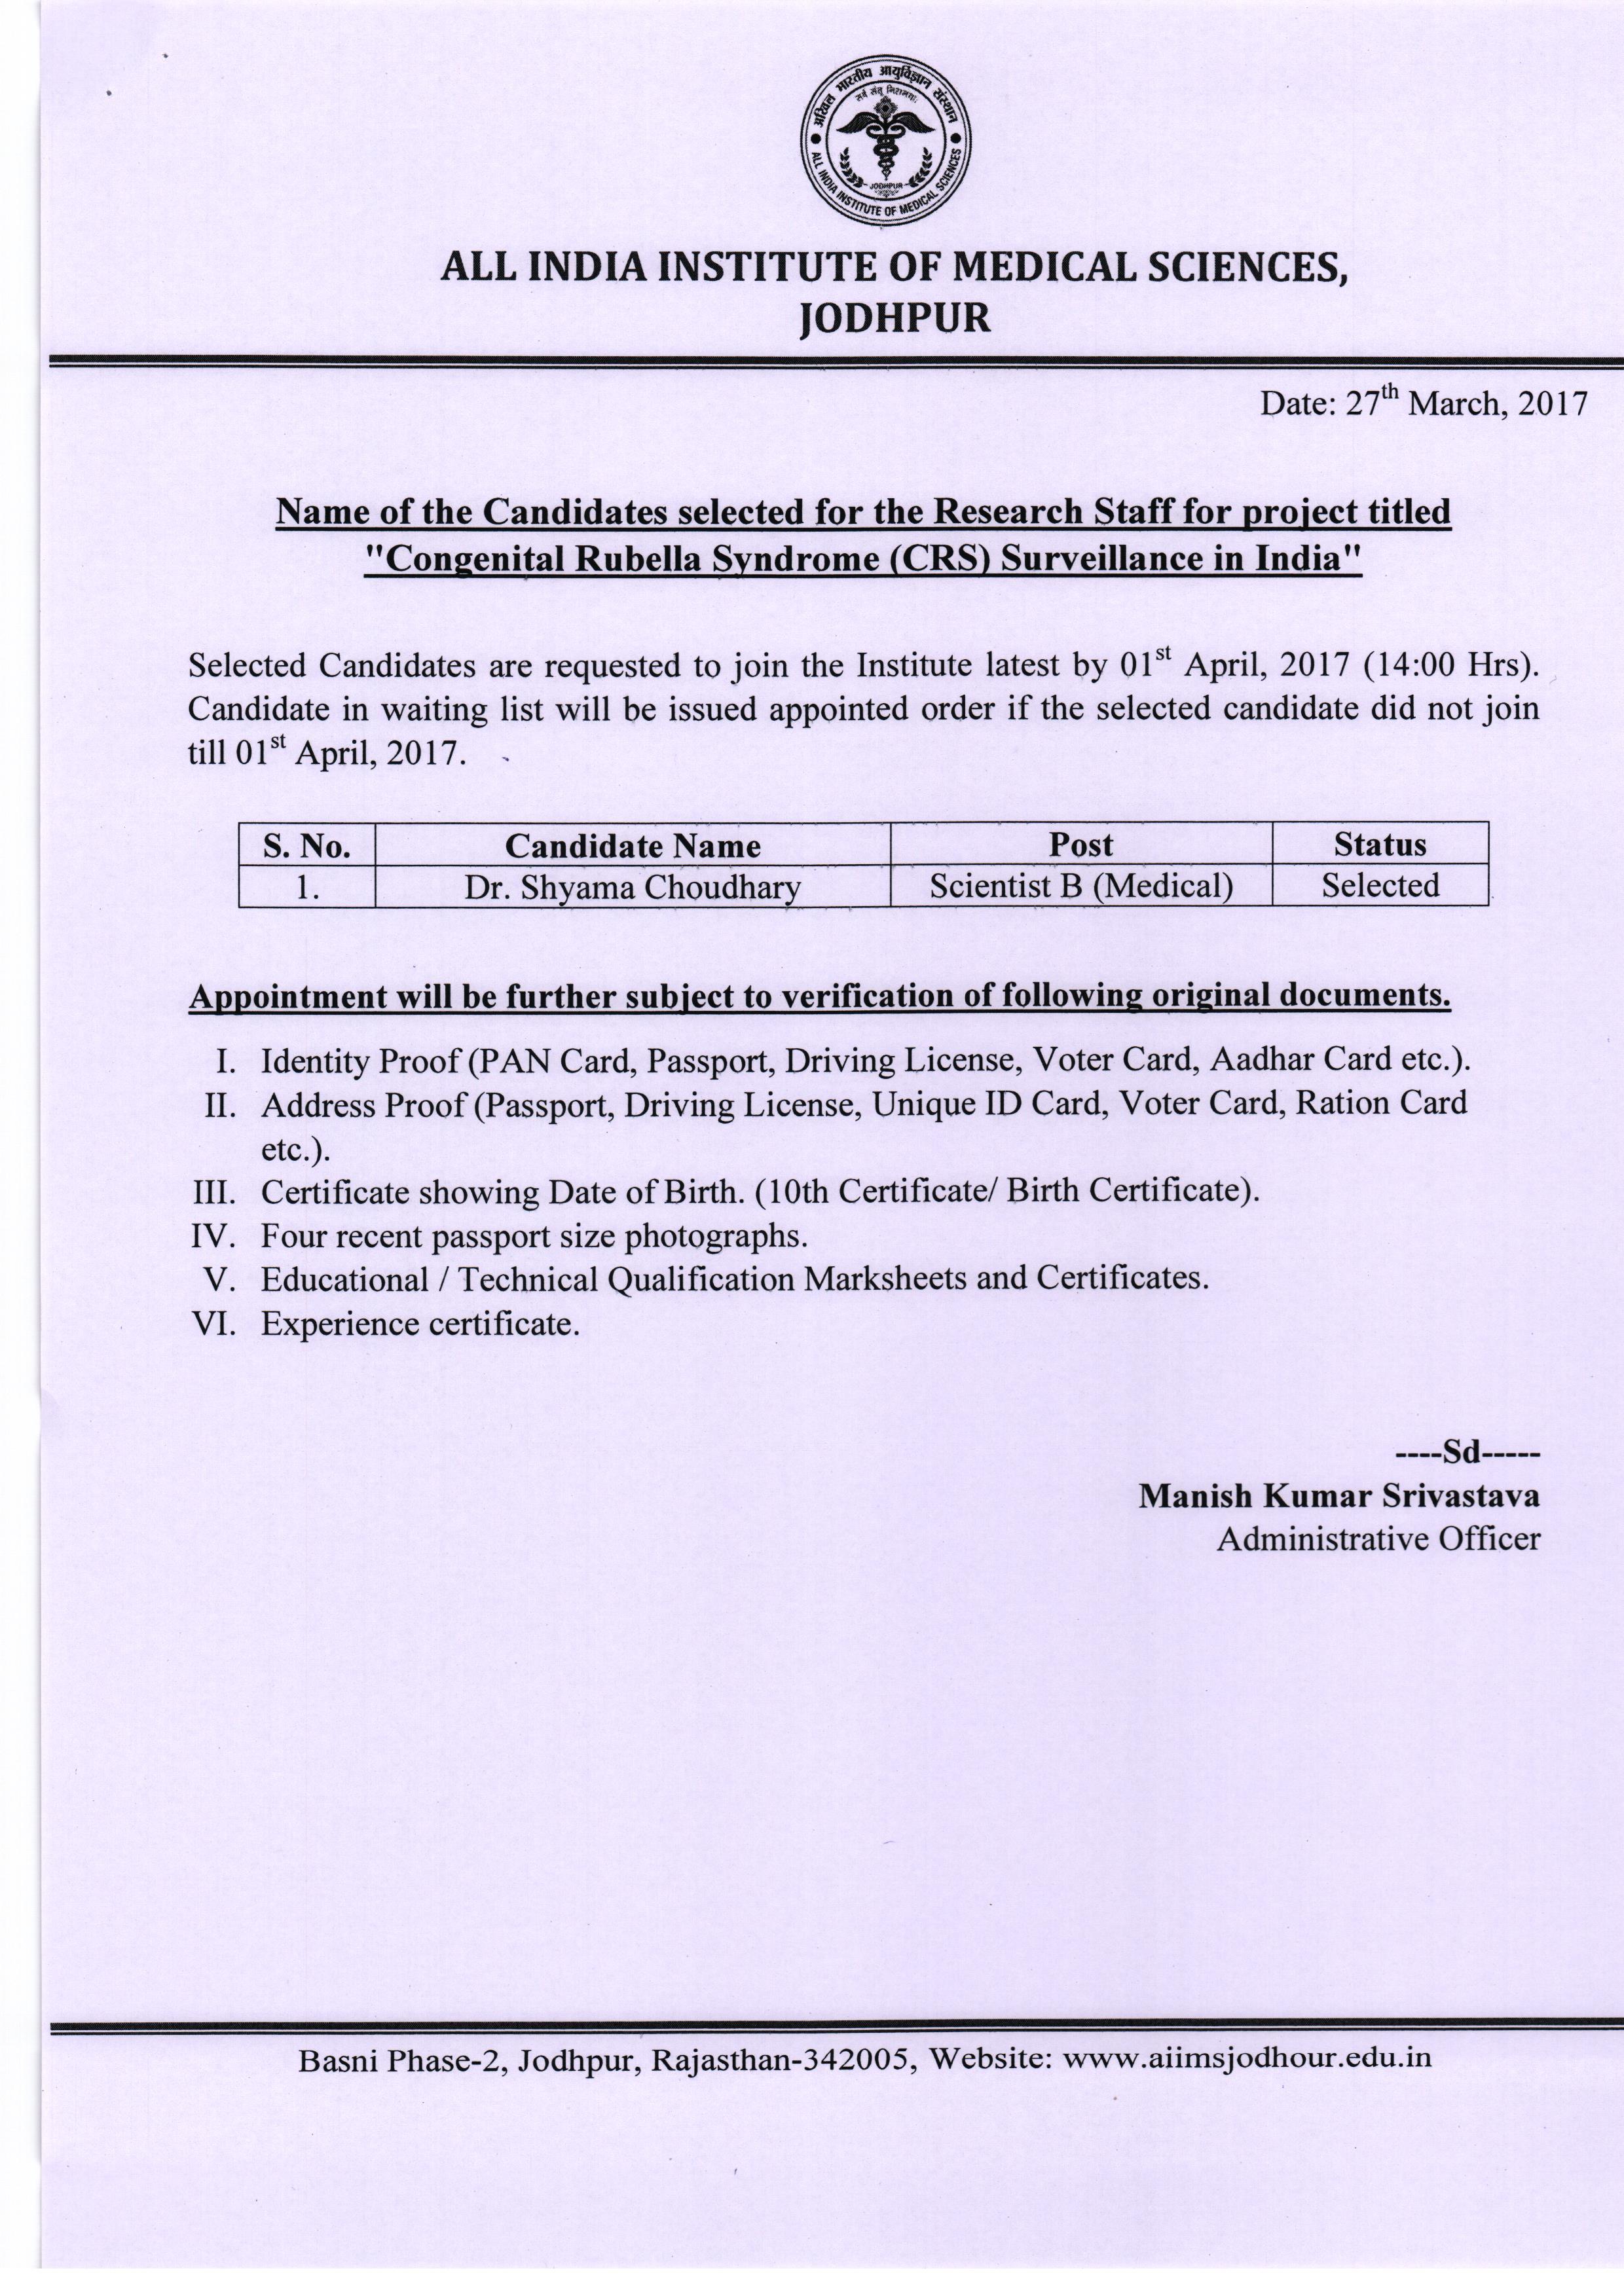 Beautiful address proof certificate format verification of sample birth certificate rajasthan choice image certificate shyama20001 sample birth certificate rajasthan xflitez Image collections